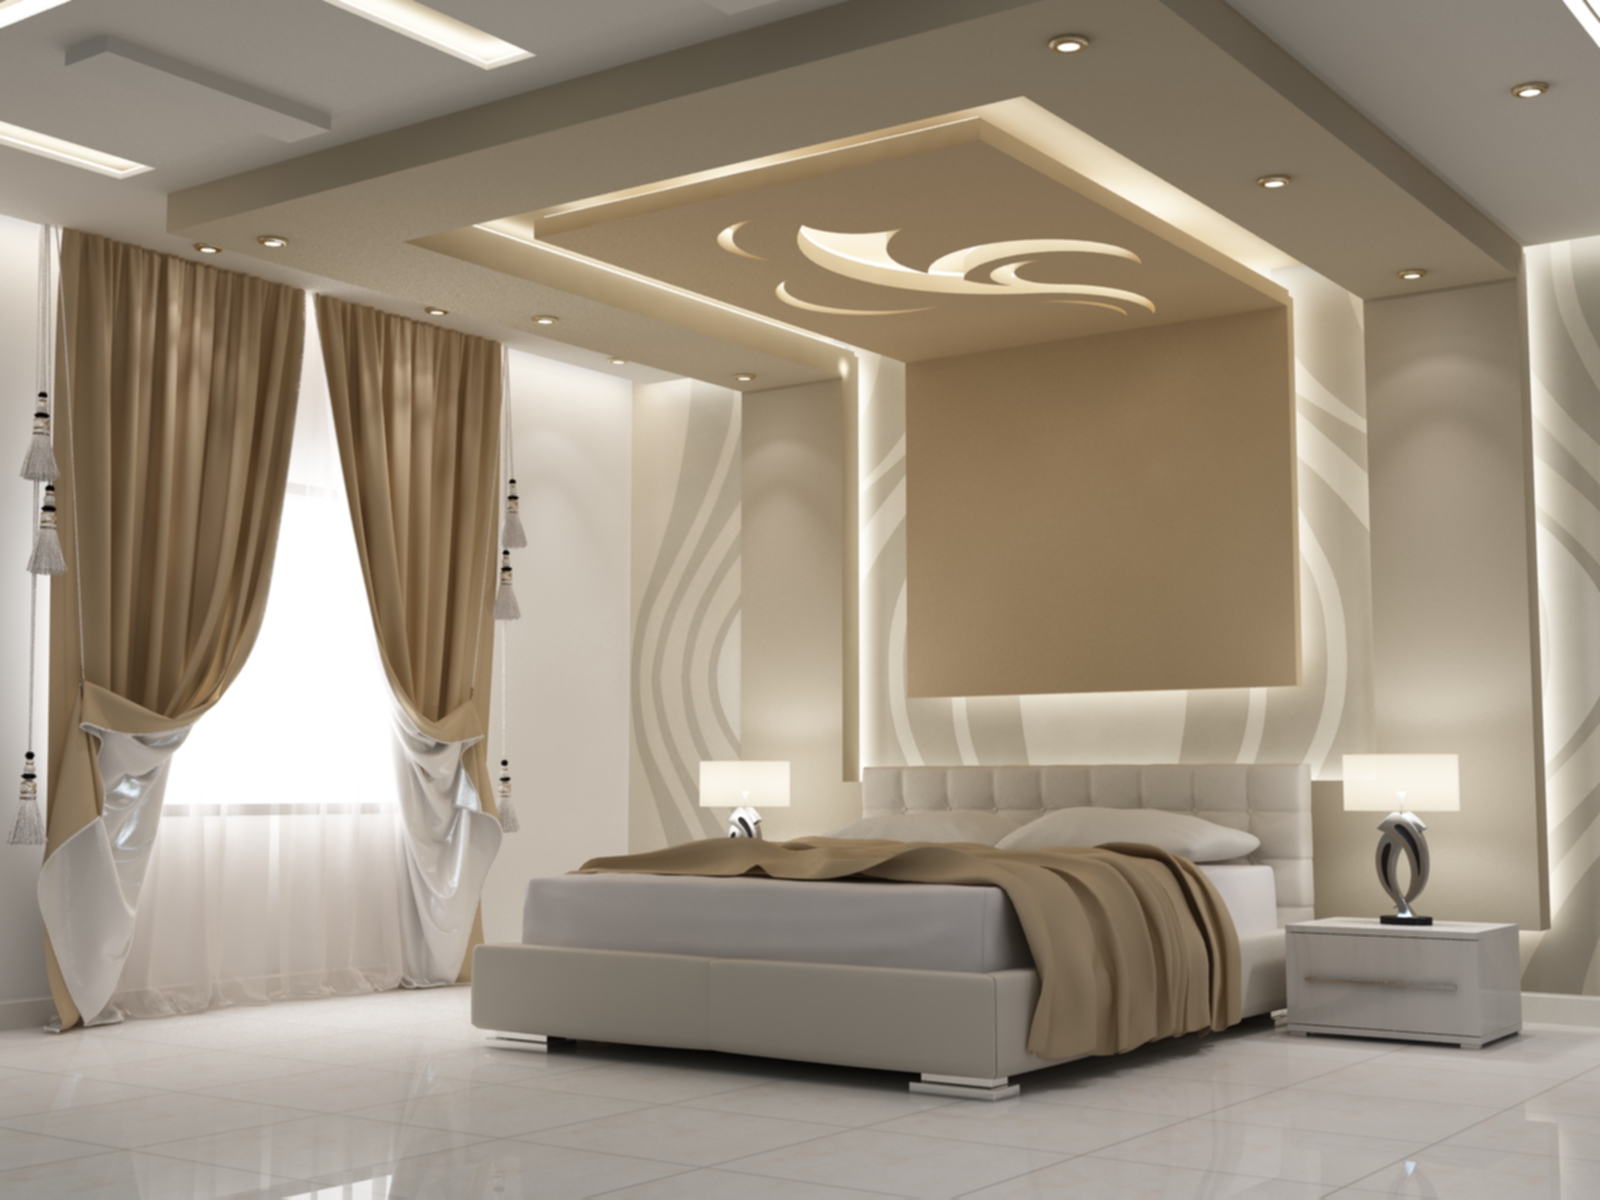 صور ديكور جبس غرف نوم , ديكورات اسقف وحوائط غرف النوم للعرسان